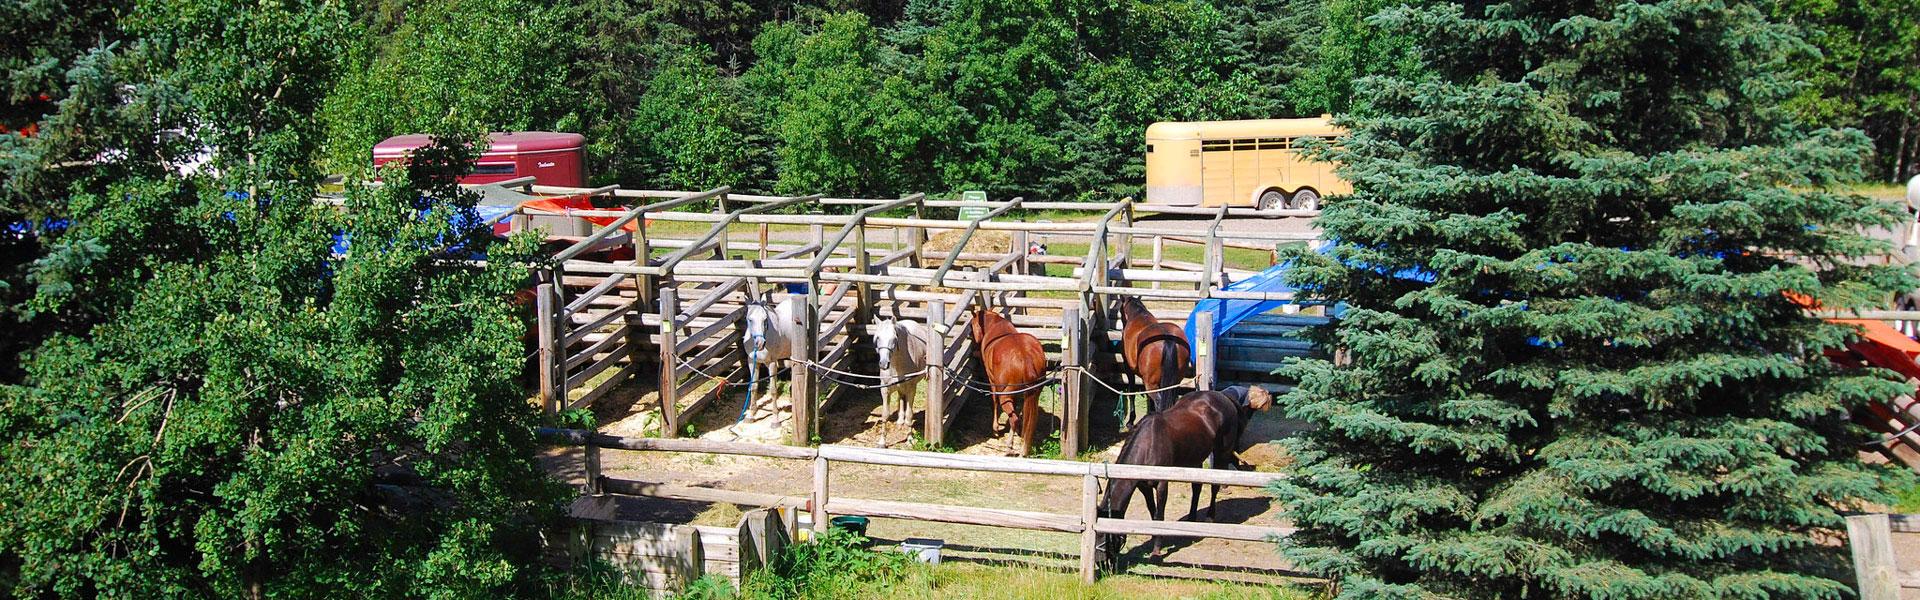 Equestrian Camping Kananaskis Country Alberta Parks